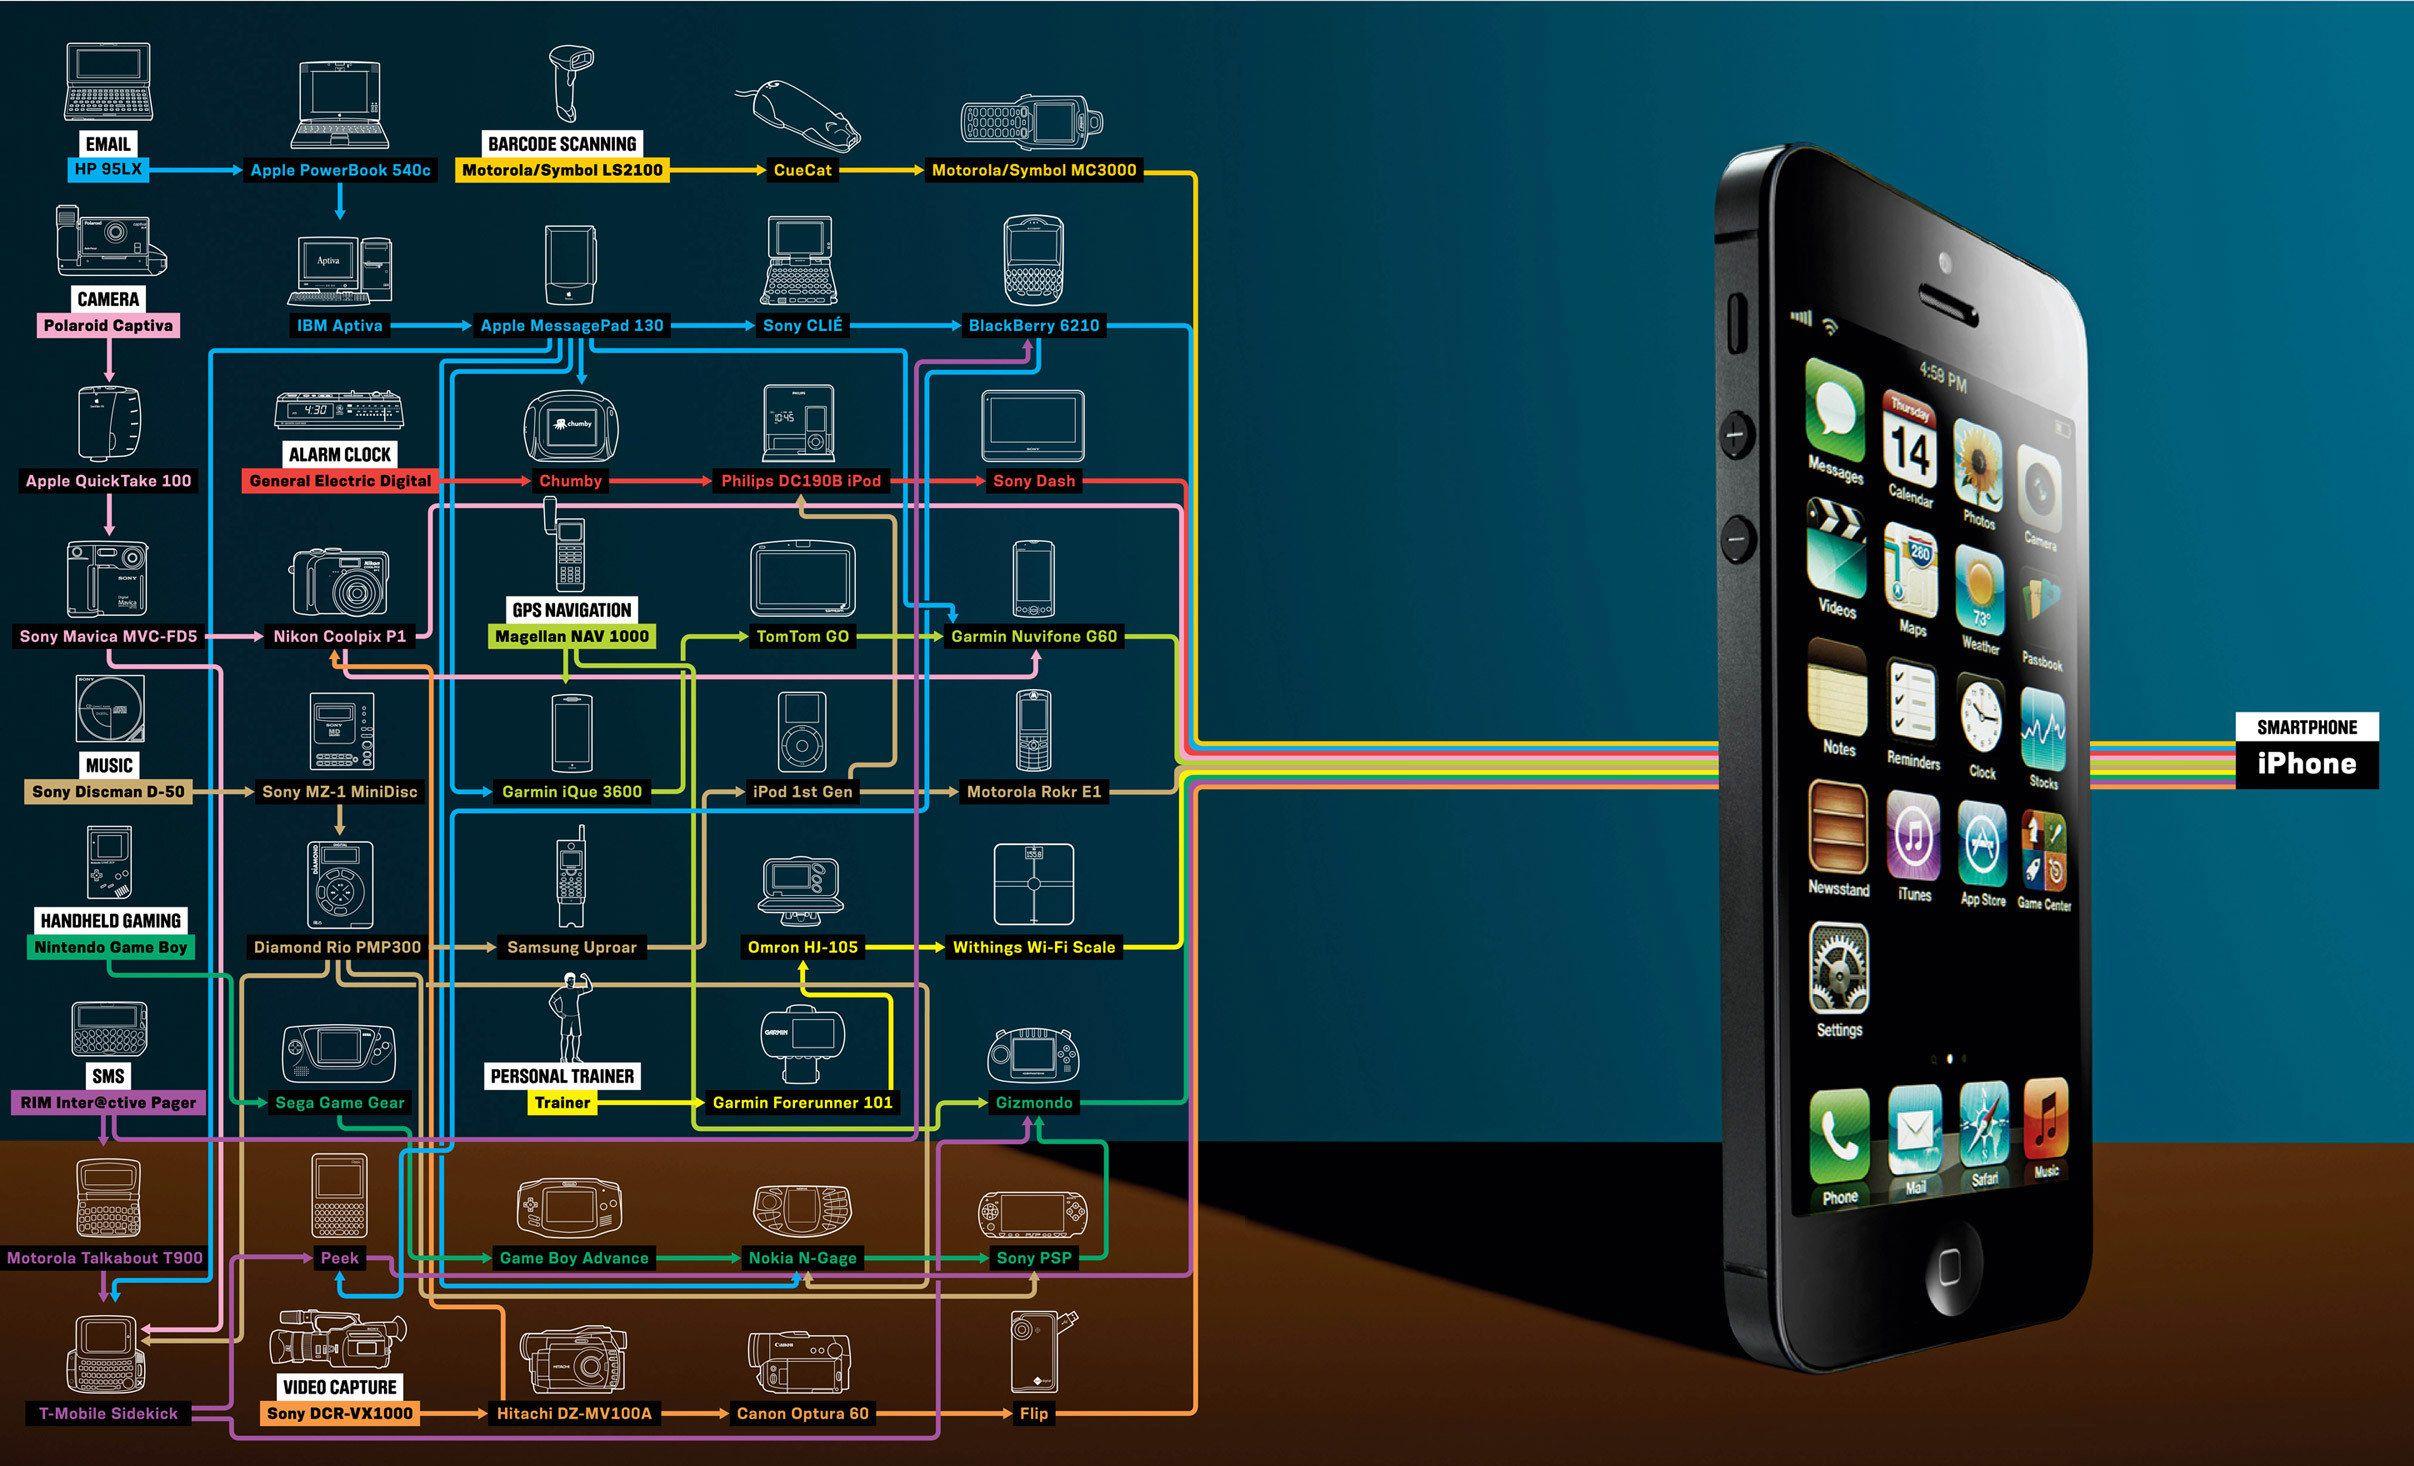 Wallpaper iphone rov - Free Iphone Wallpaper